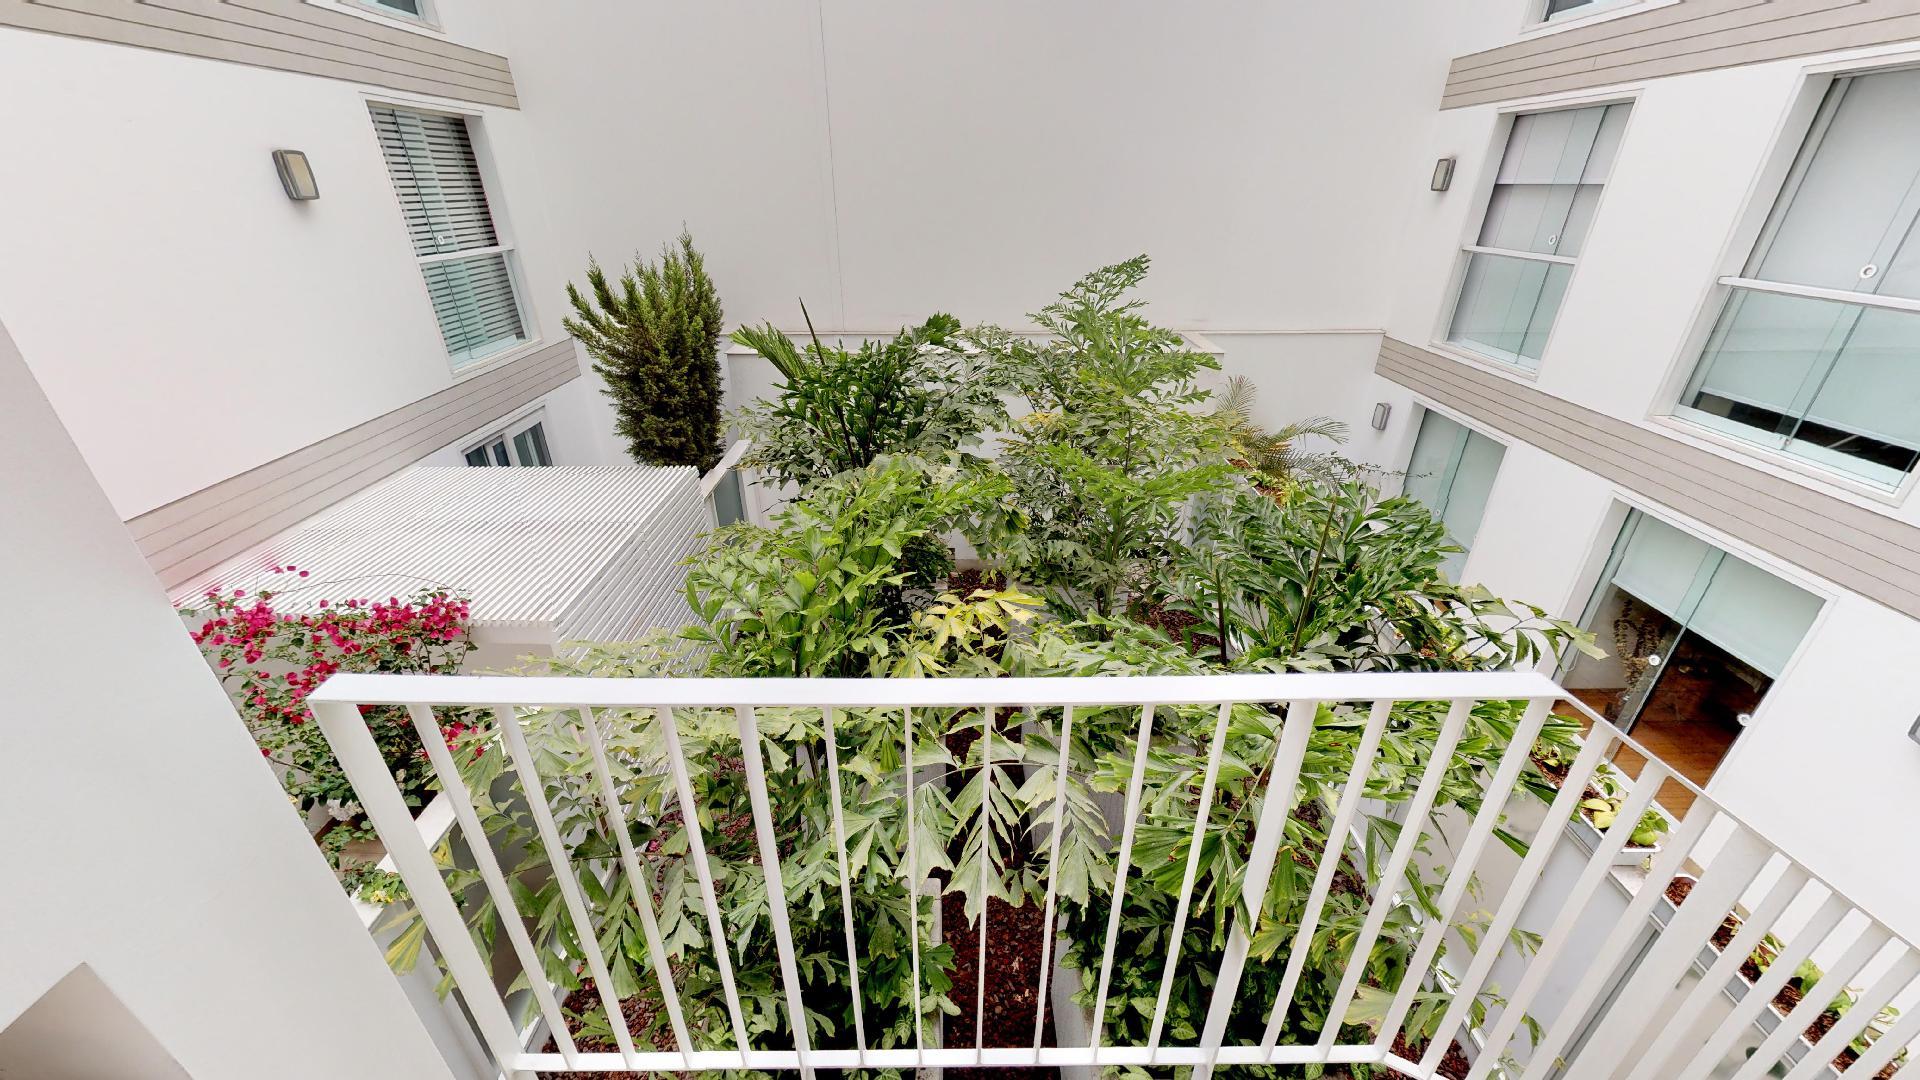 Balcón del recorrido virtual de un hermoso departamento en Sáenz Peña, Barranco, Lima, Perú